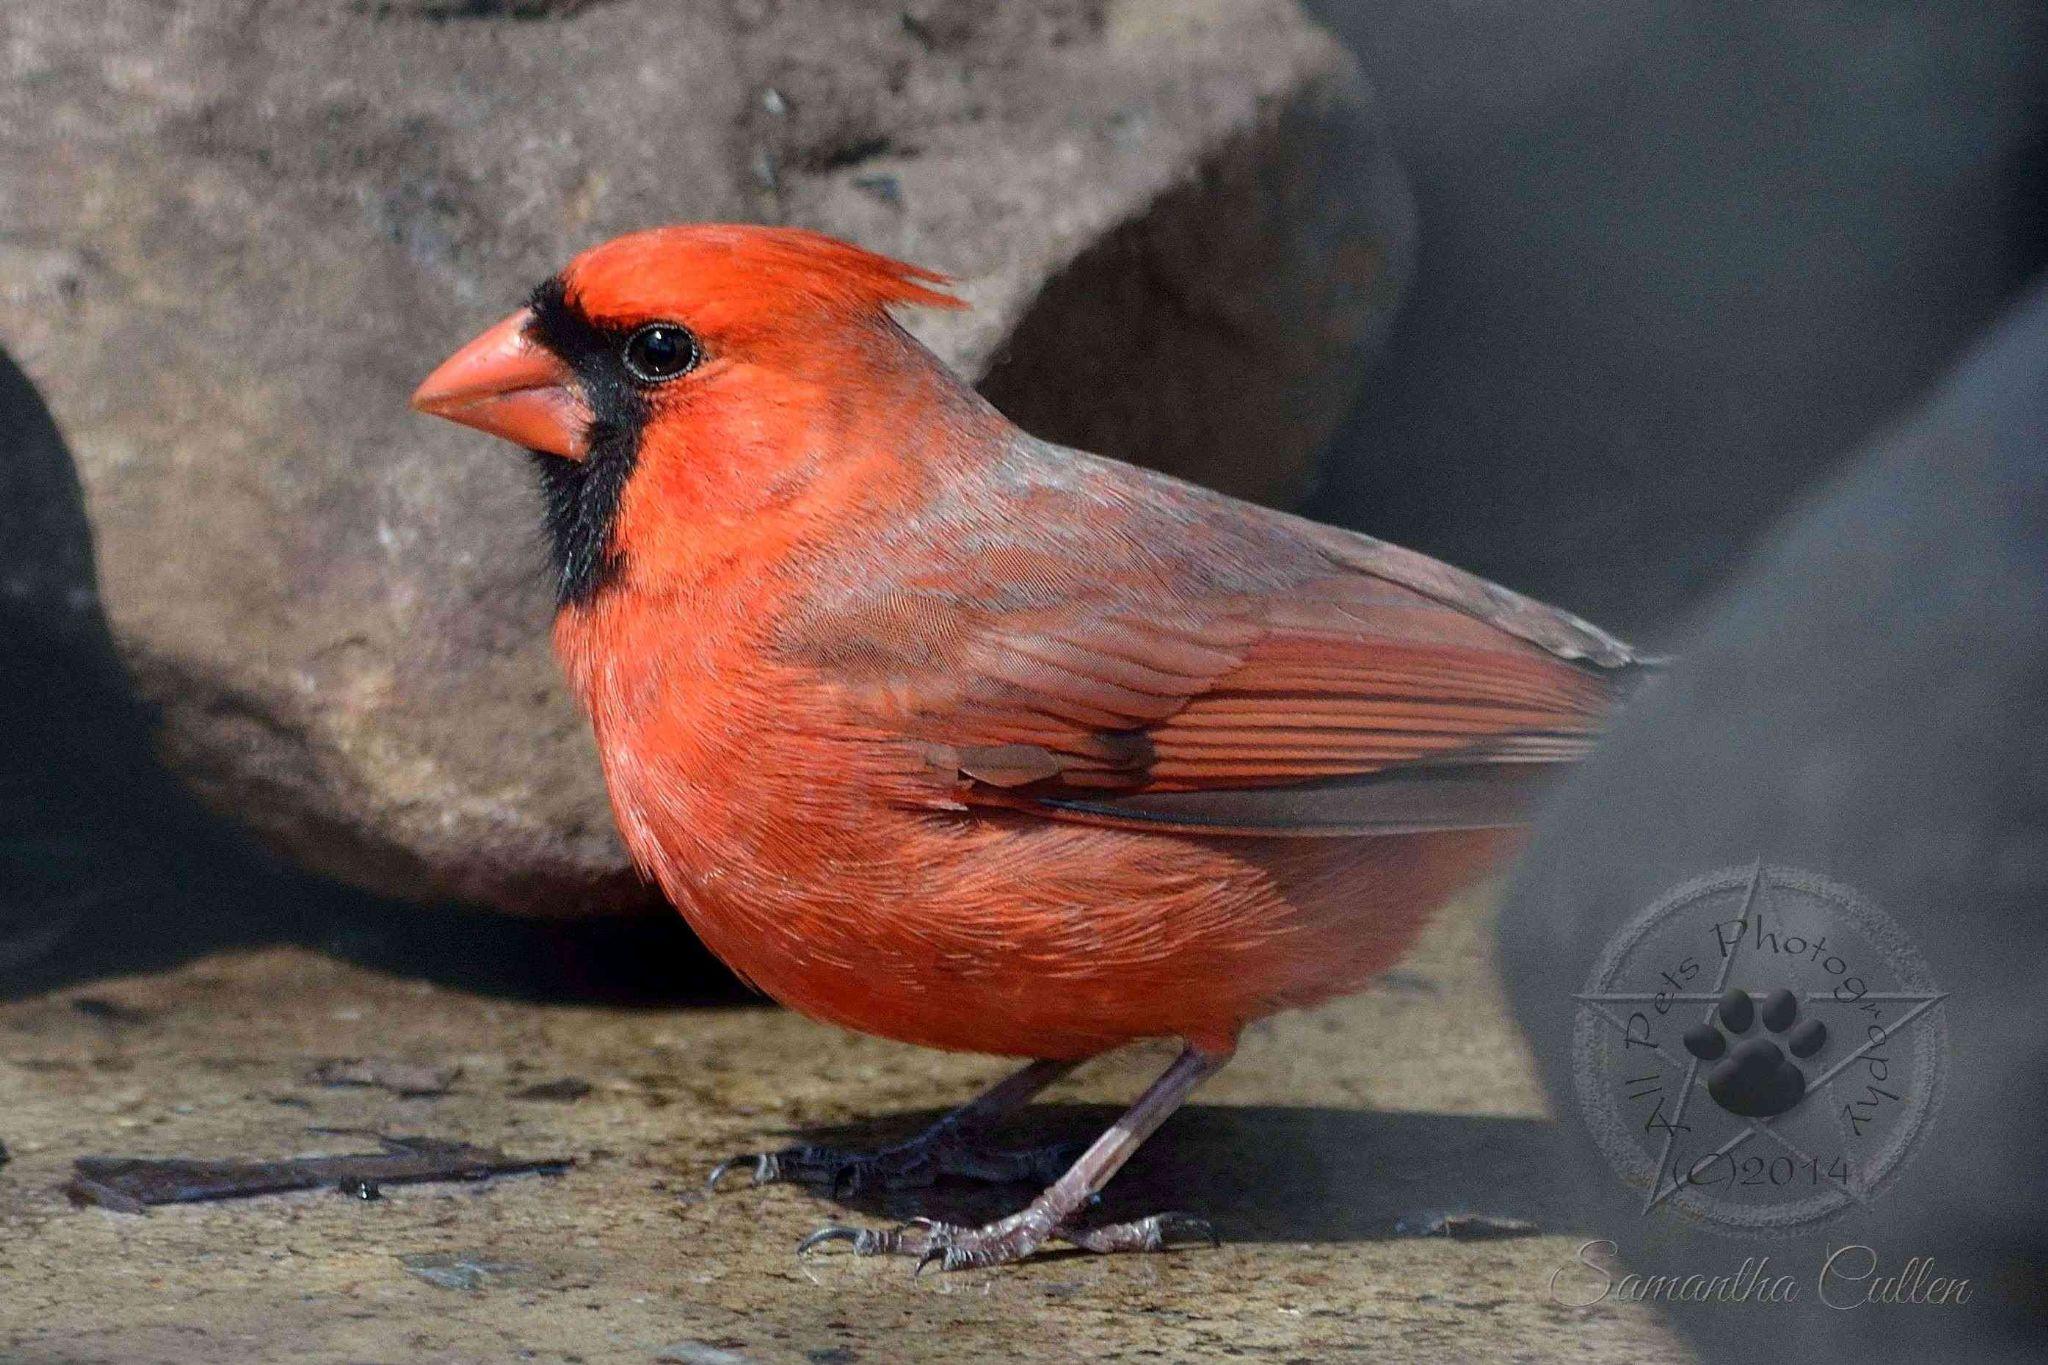 Cardinal by Samantha Cullen